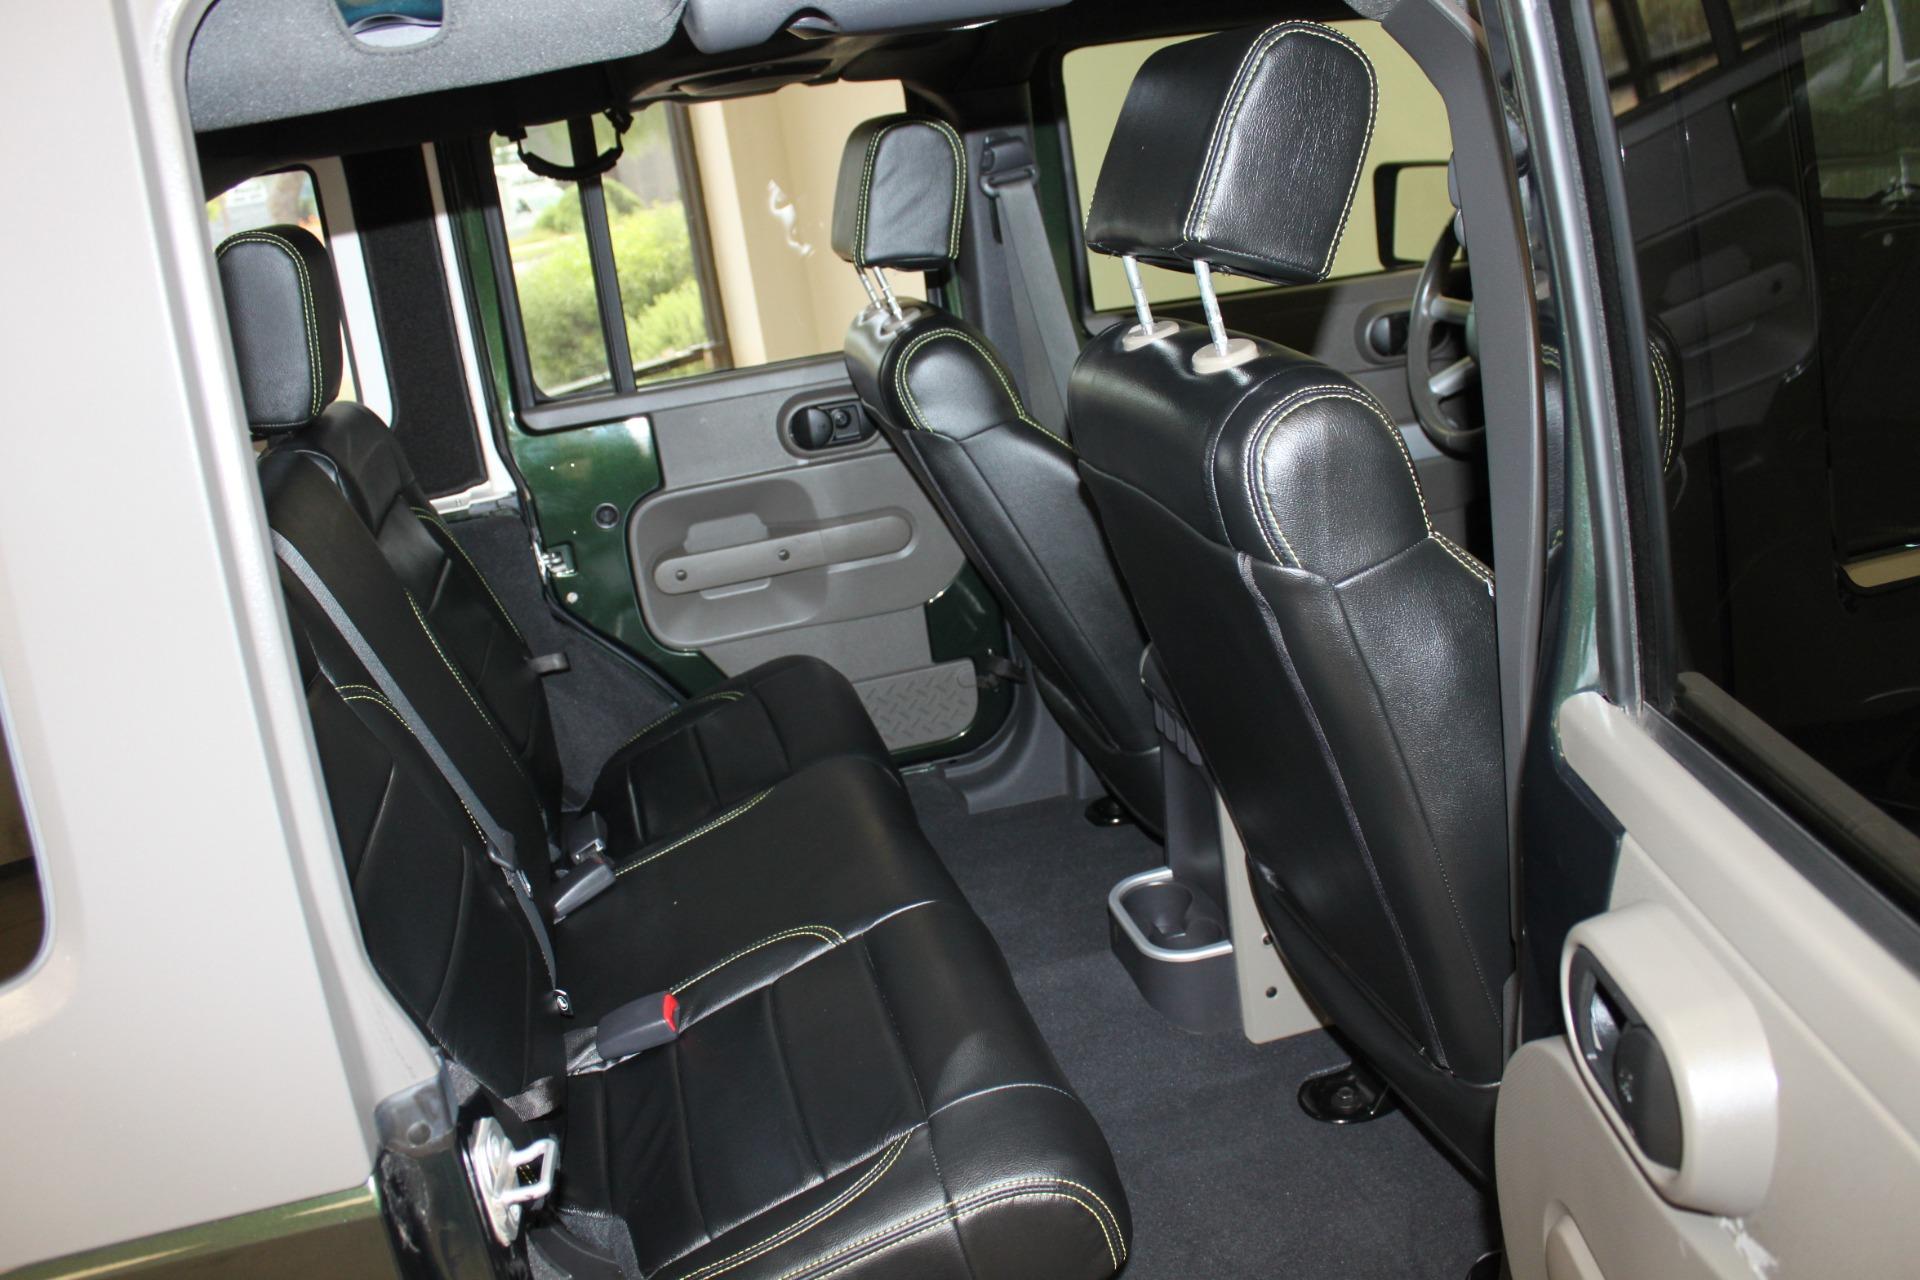 Used-2010-Jeep-Wrangler-Unlimited-Sahara-4X4-Lexus